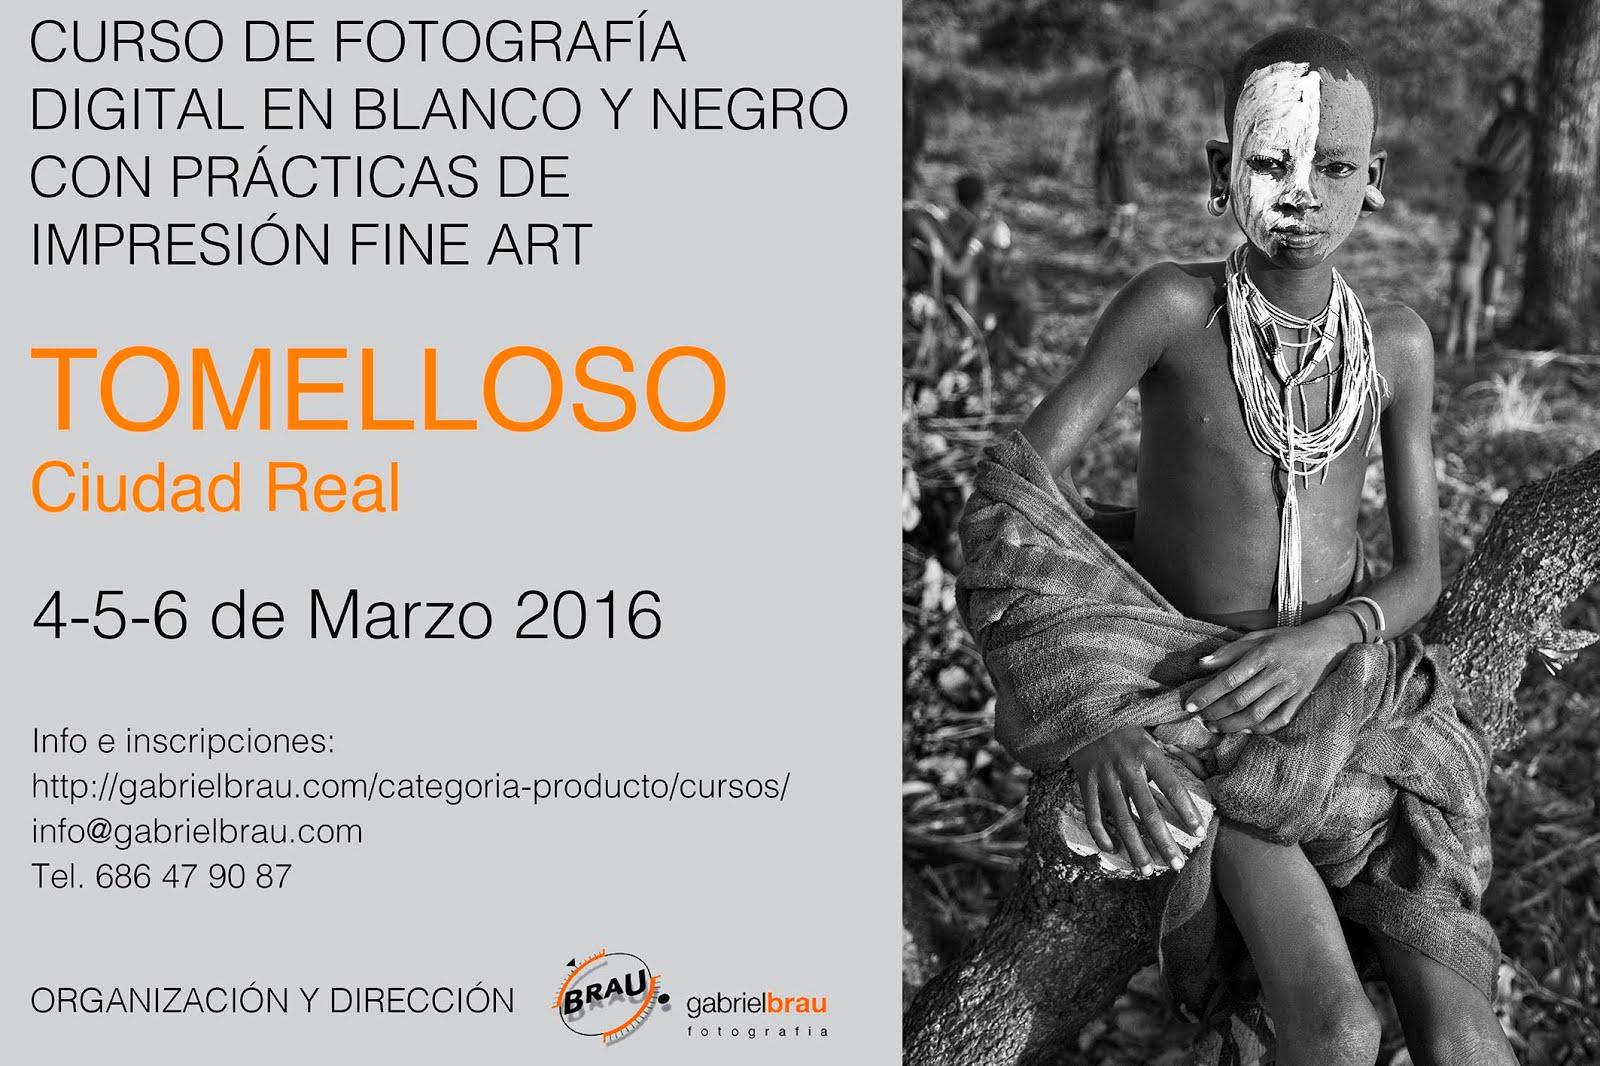 ¿Te interesa la fotografía digital?